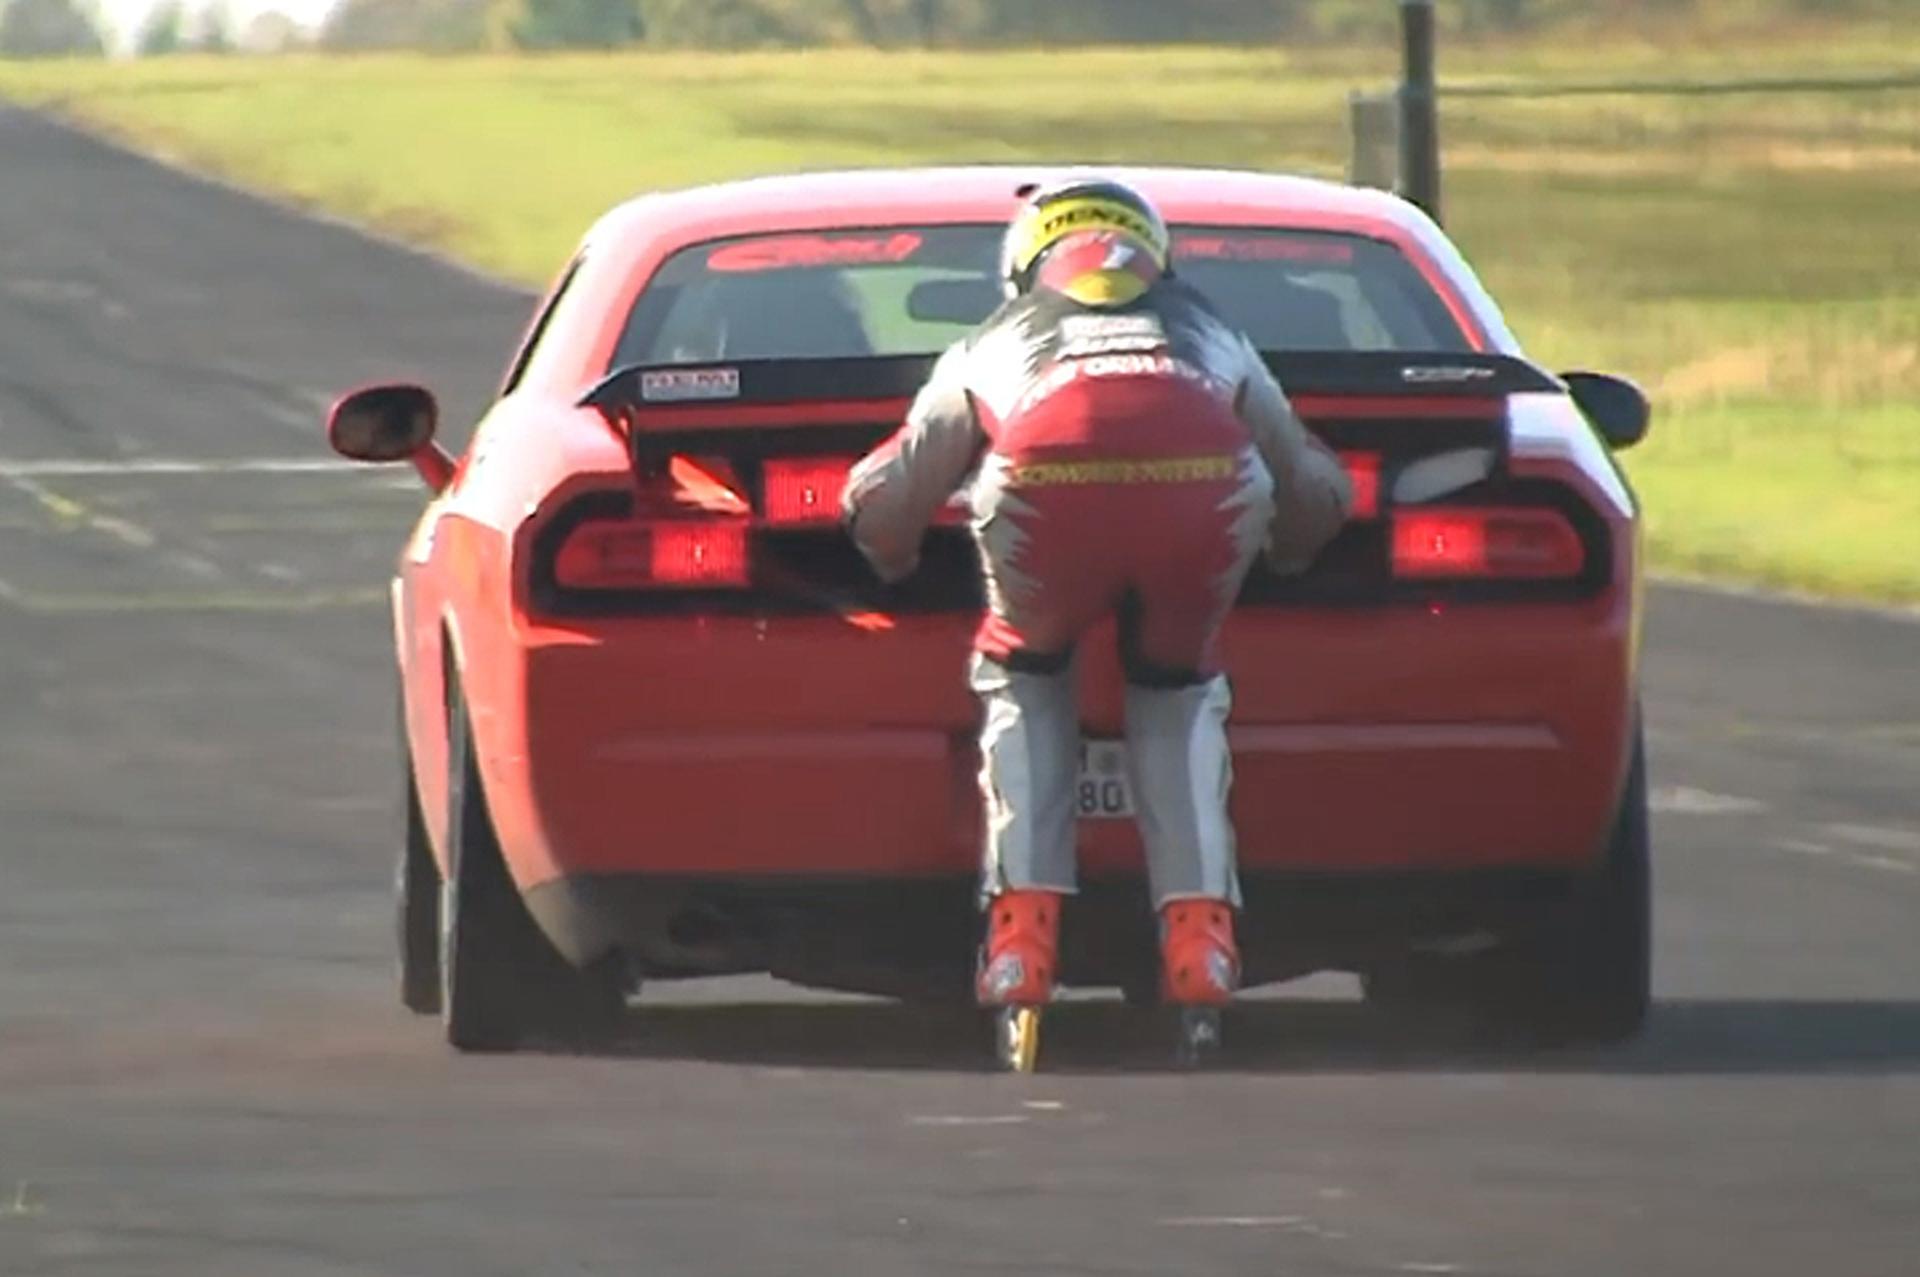 Guy Skates Behind a Dodge Challenger SRT8, Has A Lot of Guts